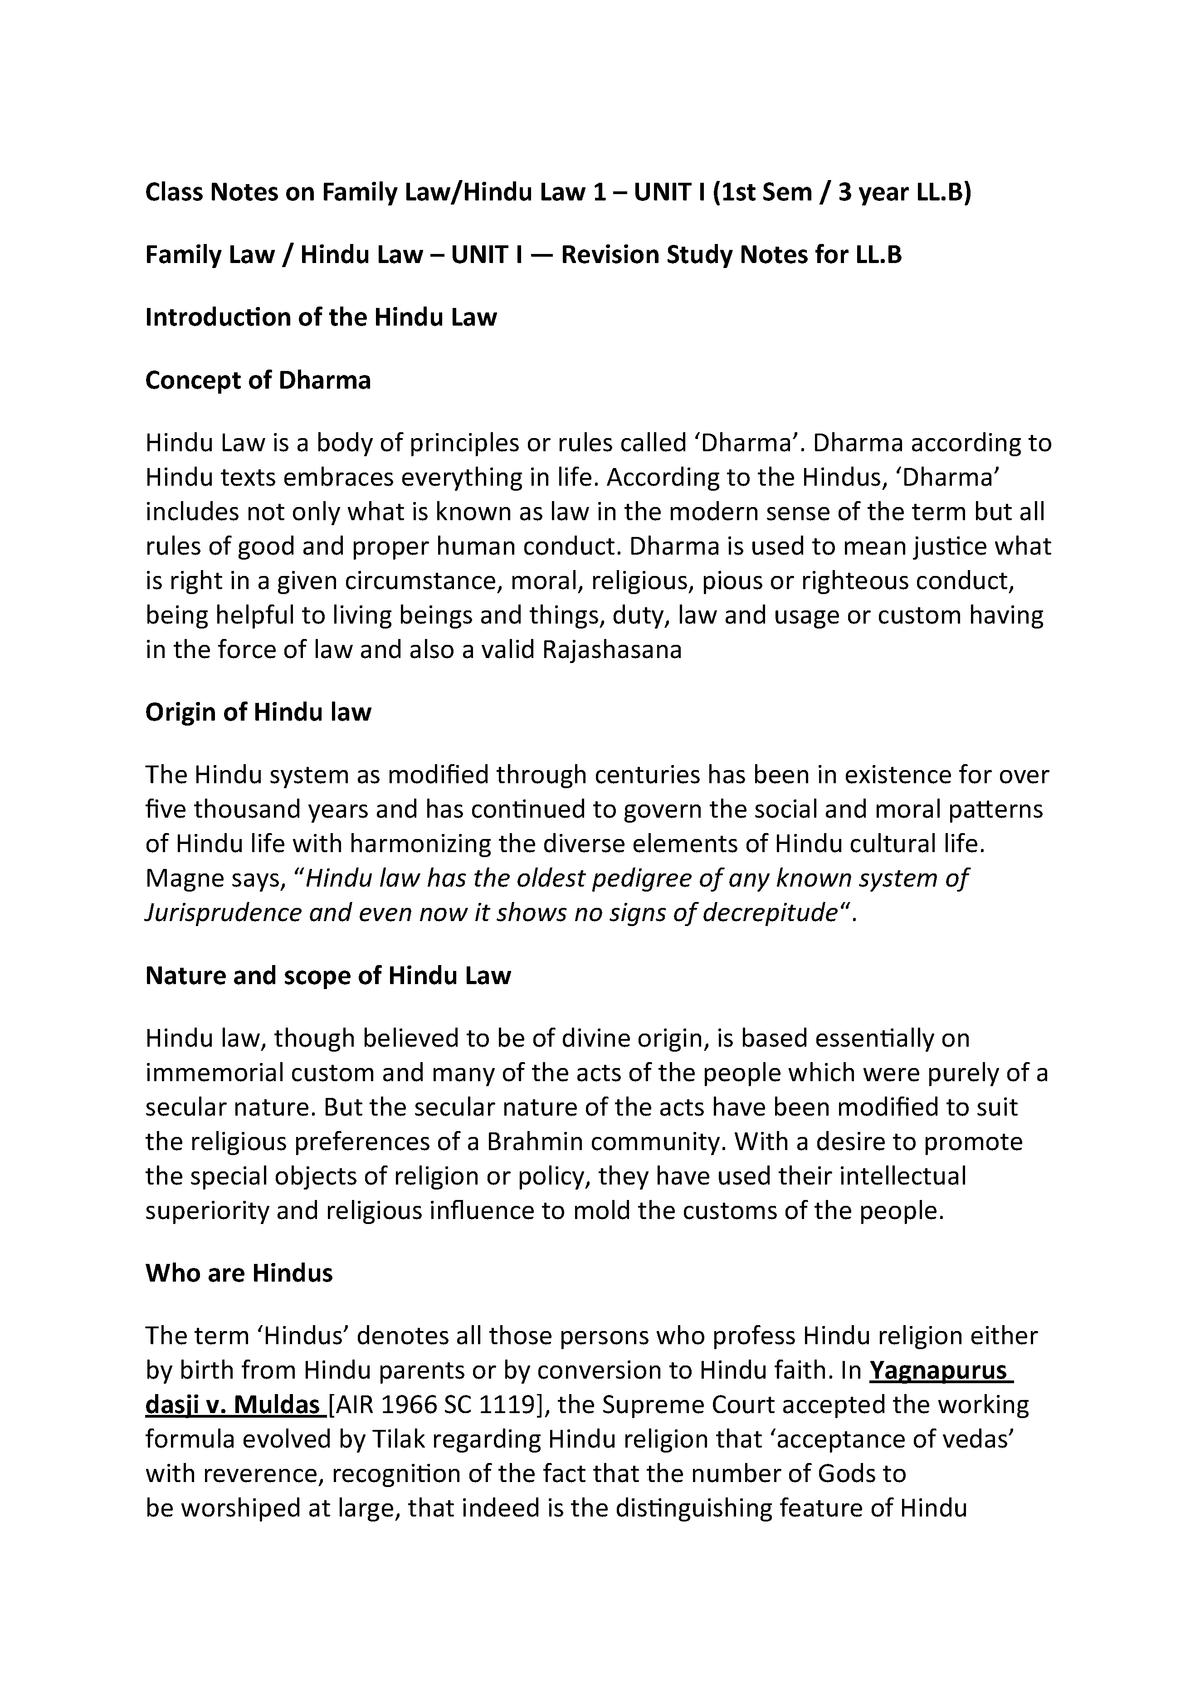 LLB Notes- Family Law -1 (Hindu Law) - - StuDocu